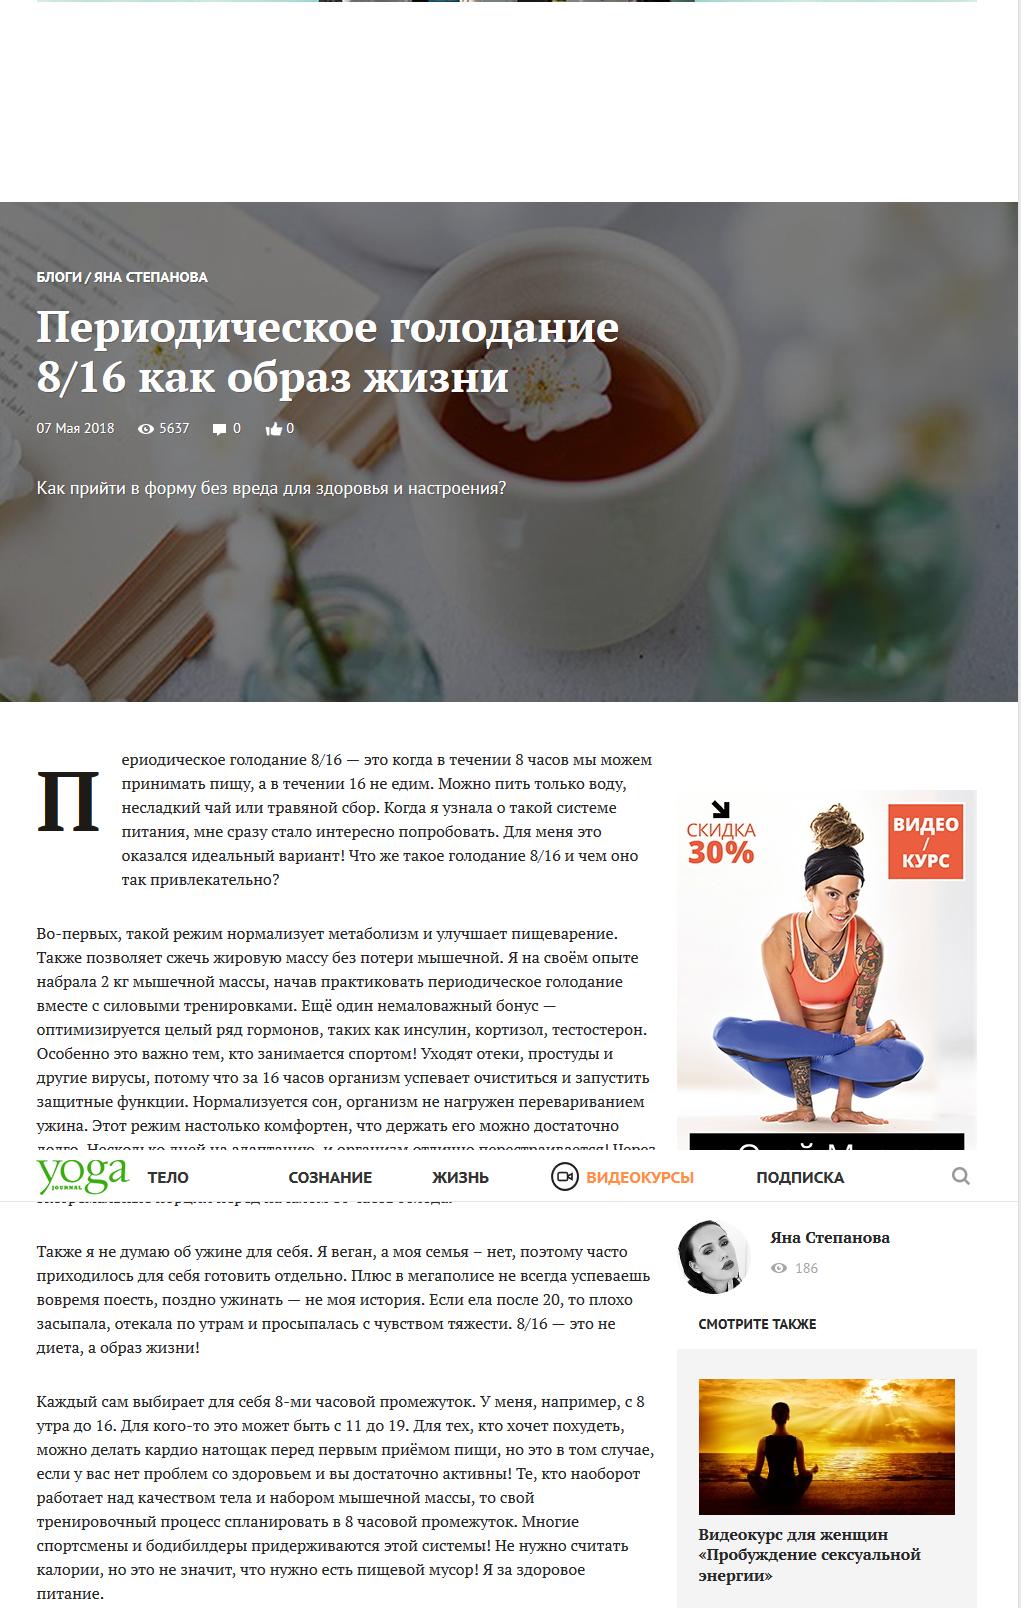 https://yogajournal.ru/blogs/yana-stepanova/periodicheskoe-golodanie-8-16-kak-obraz-zhizni-/